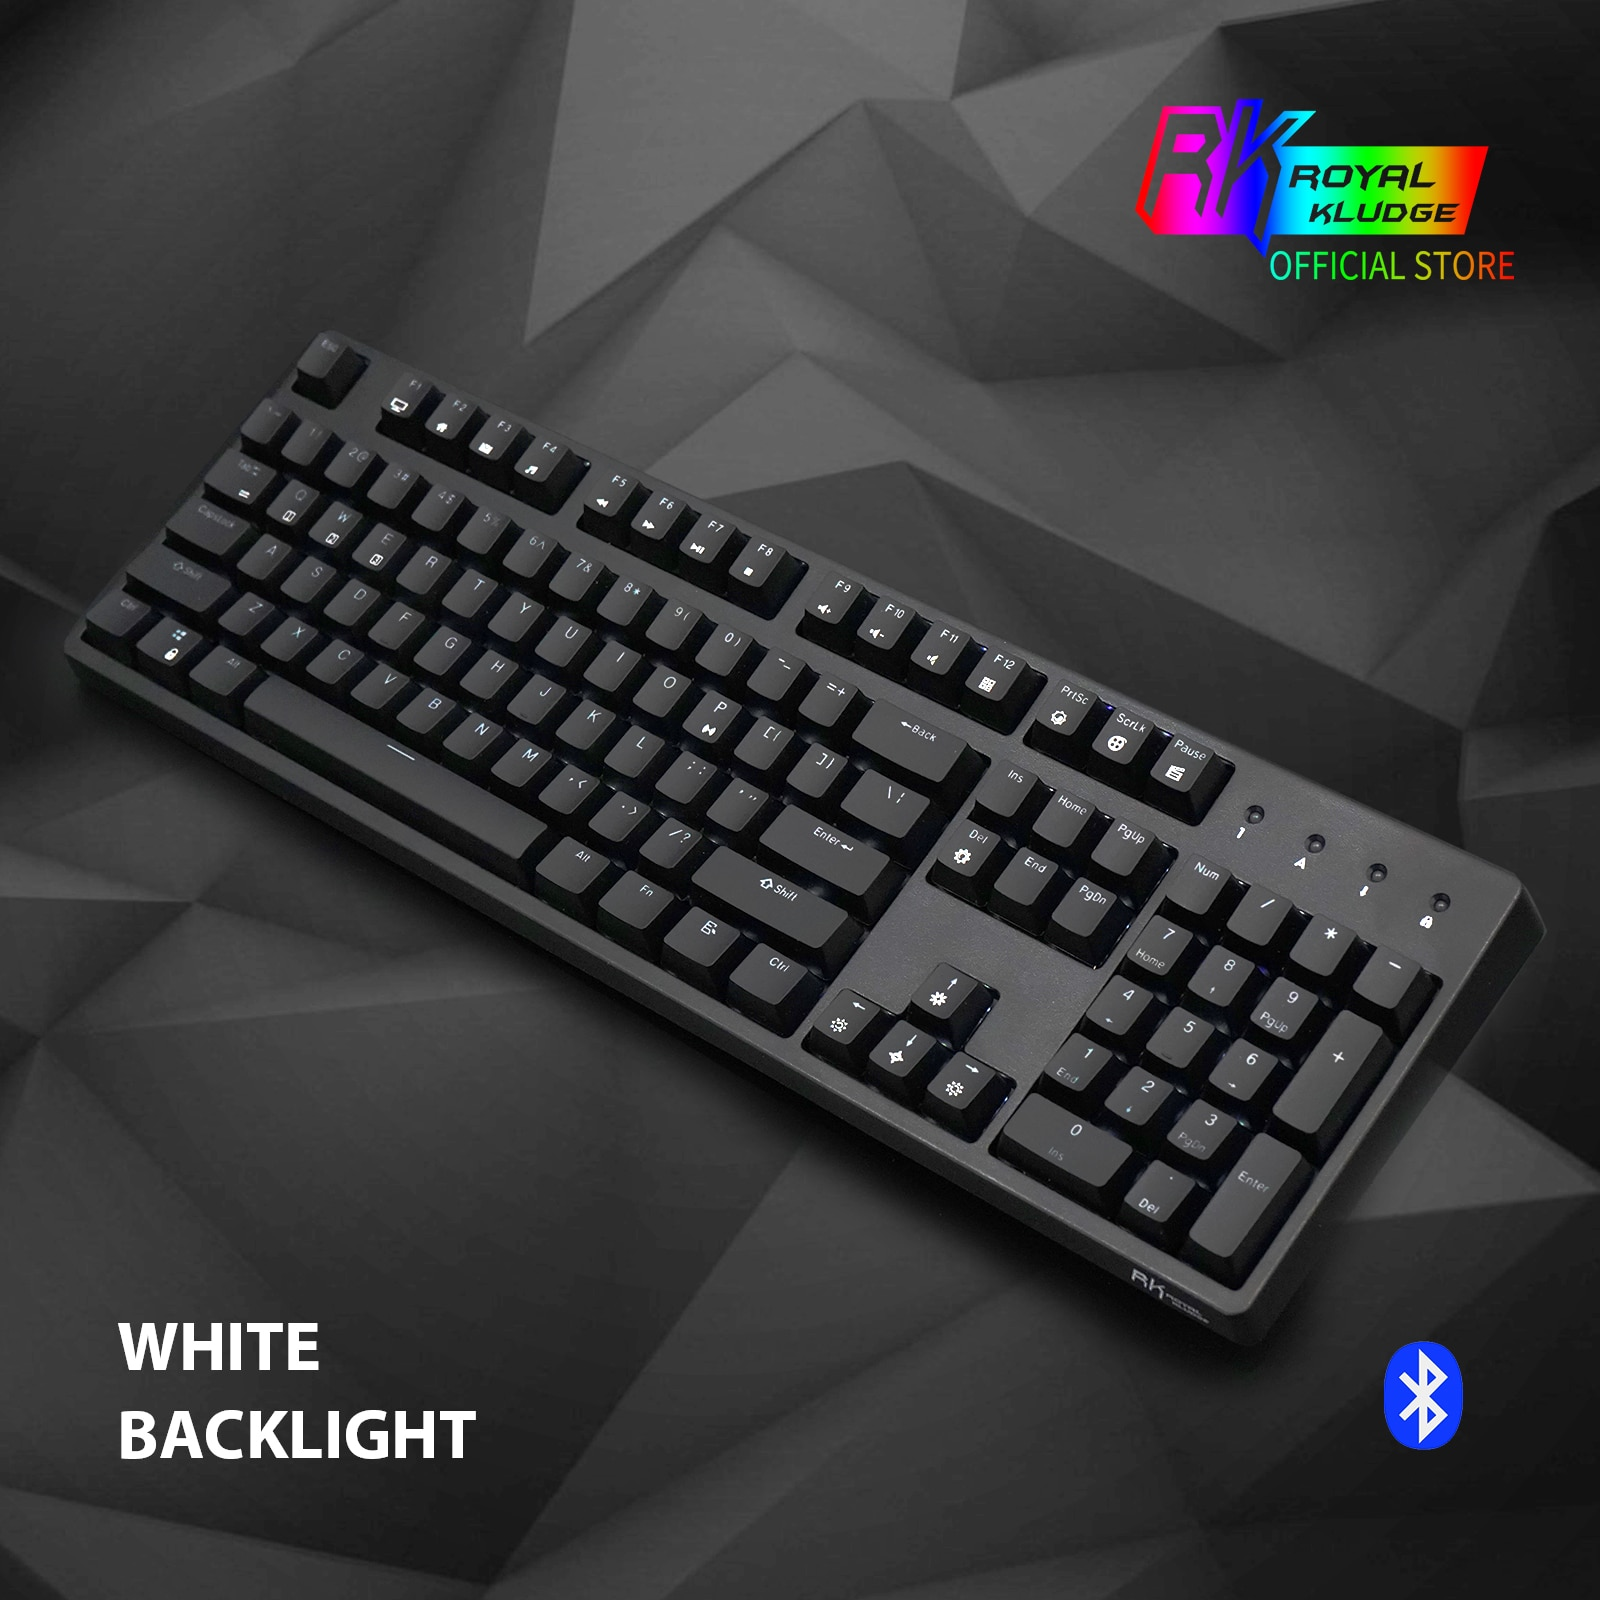 Promo RK988 RK ROYAL KLUDGE Dual Mode Wireless/USB Ergonomic White Backlit Mechanical Gaming Keyboard Brown Switch 104 Keys